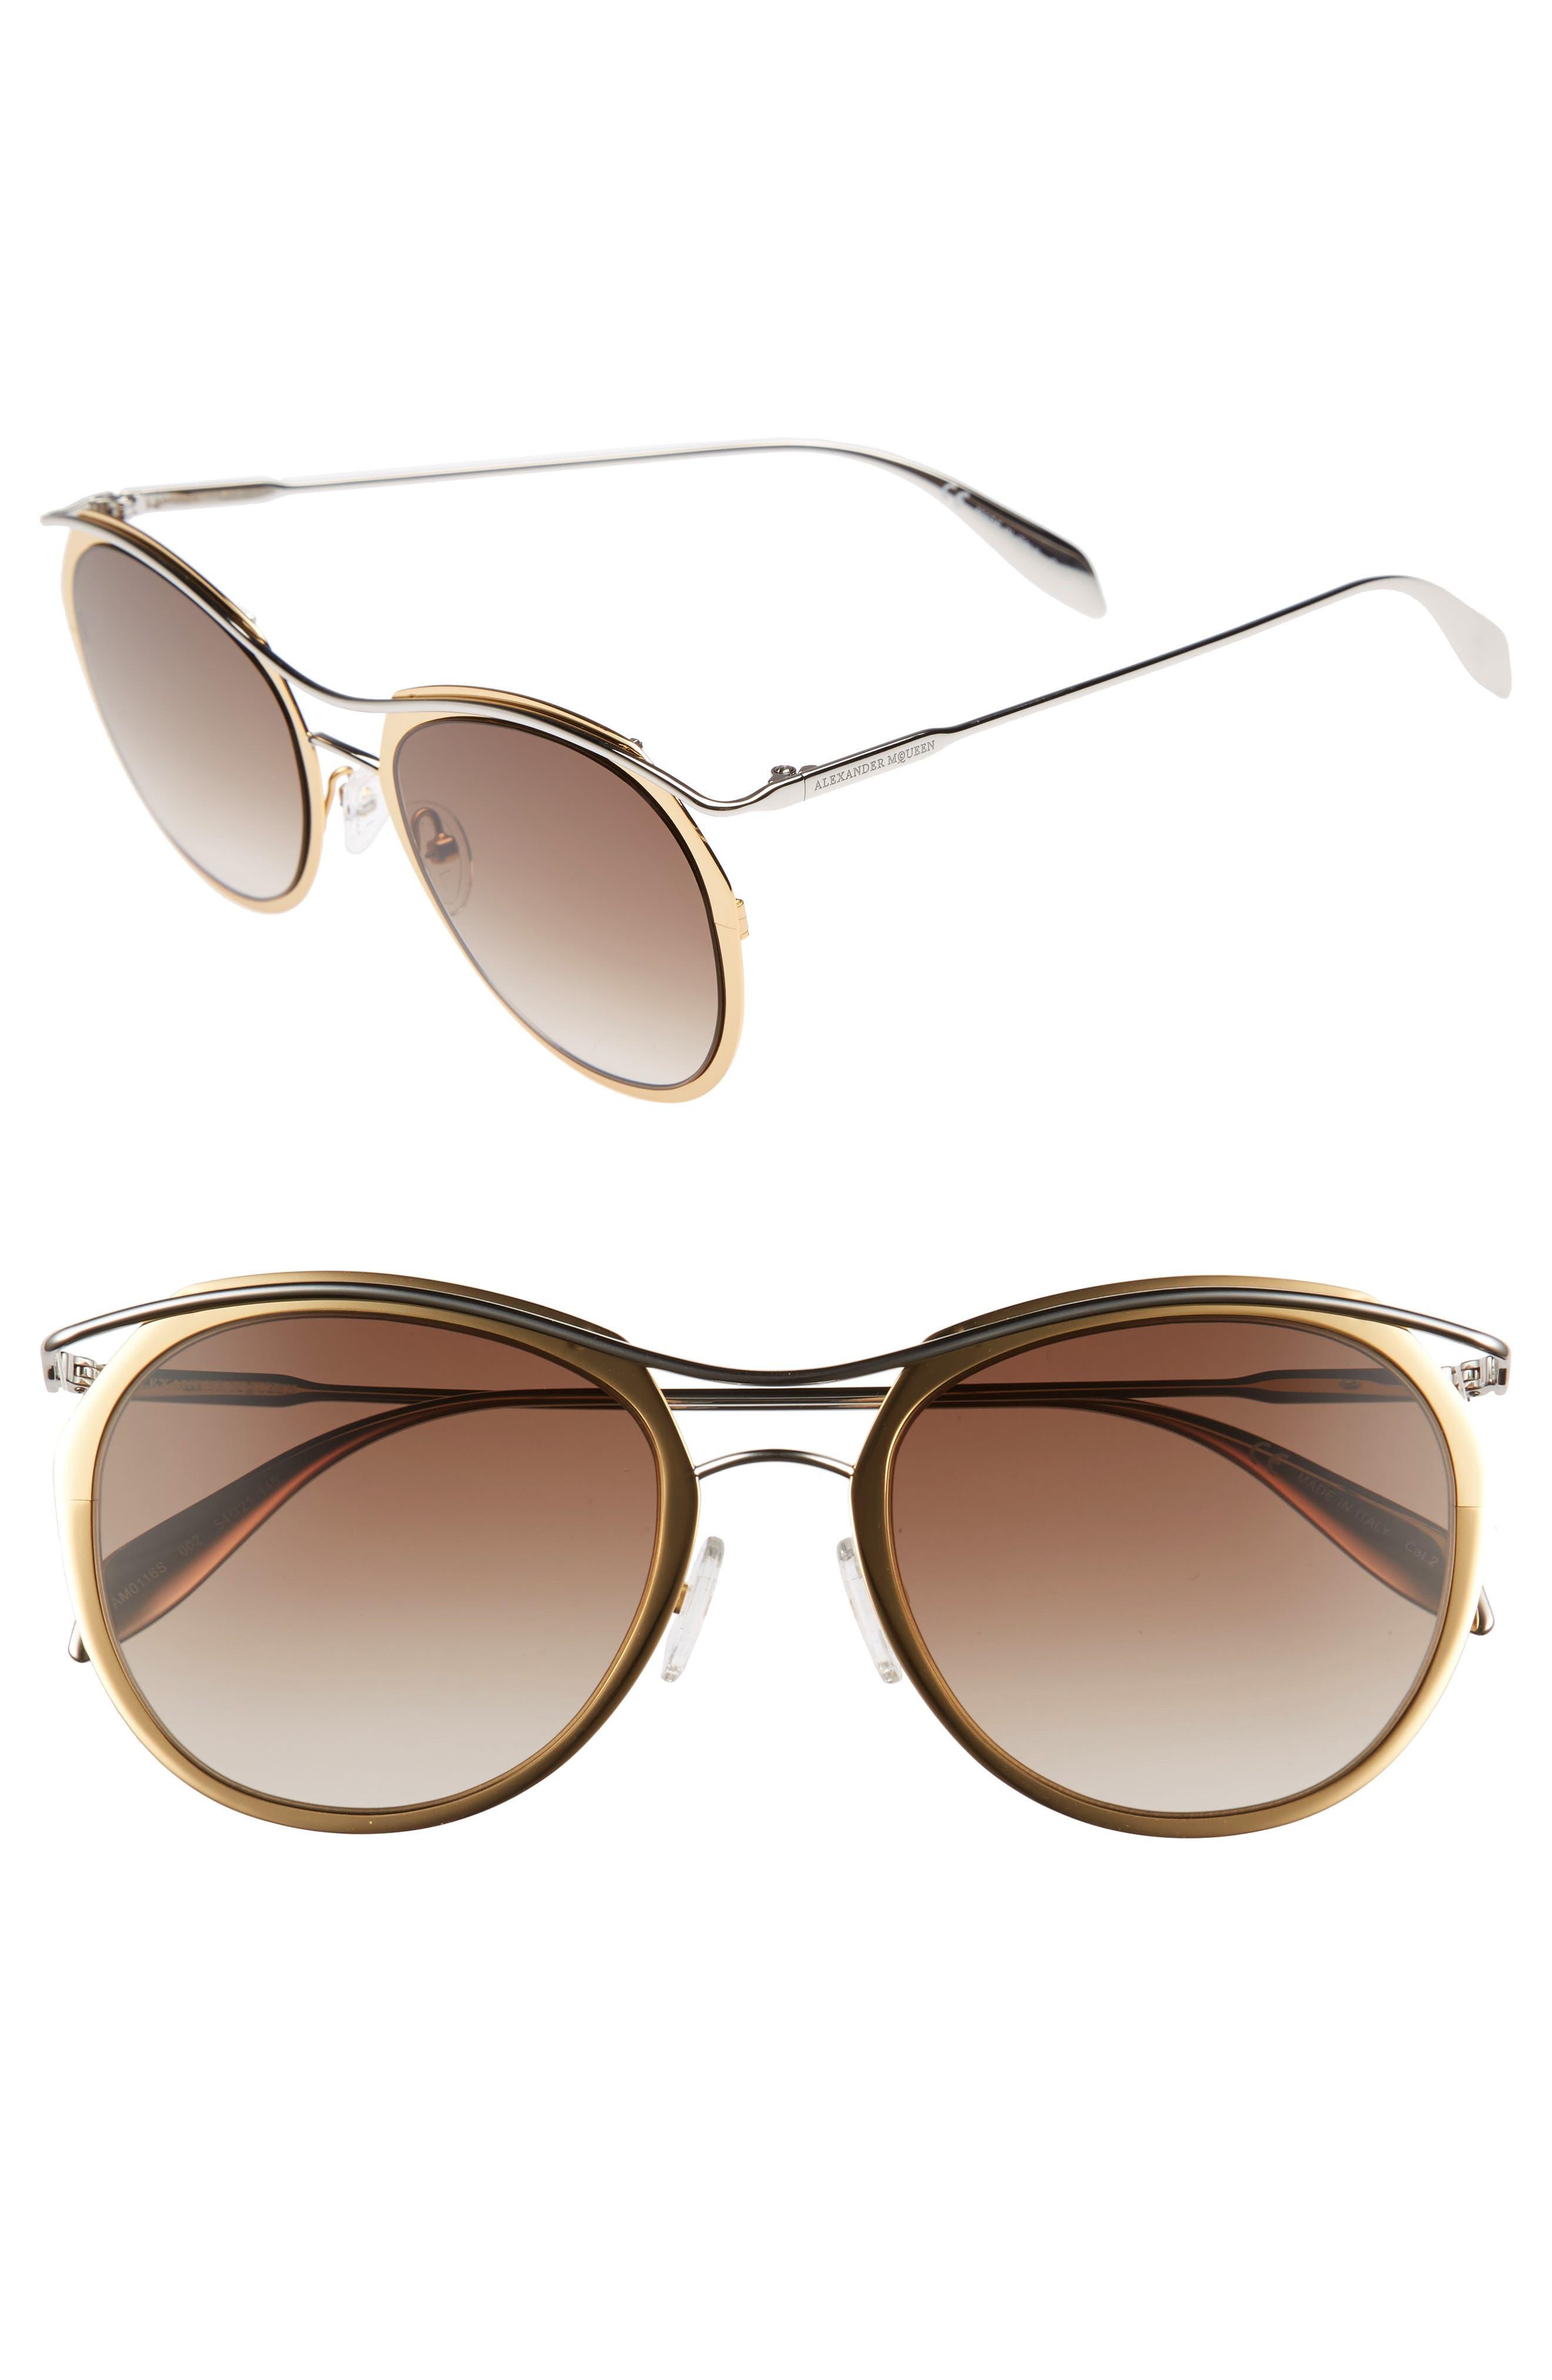 Alexander McQueen 54mm Gradient Round Sunglasses